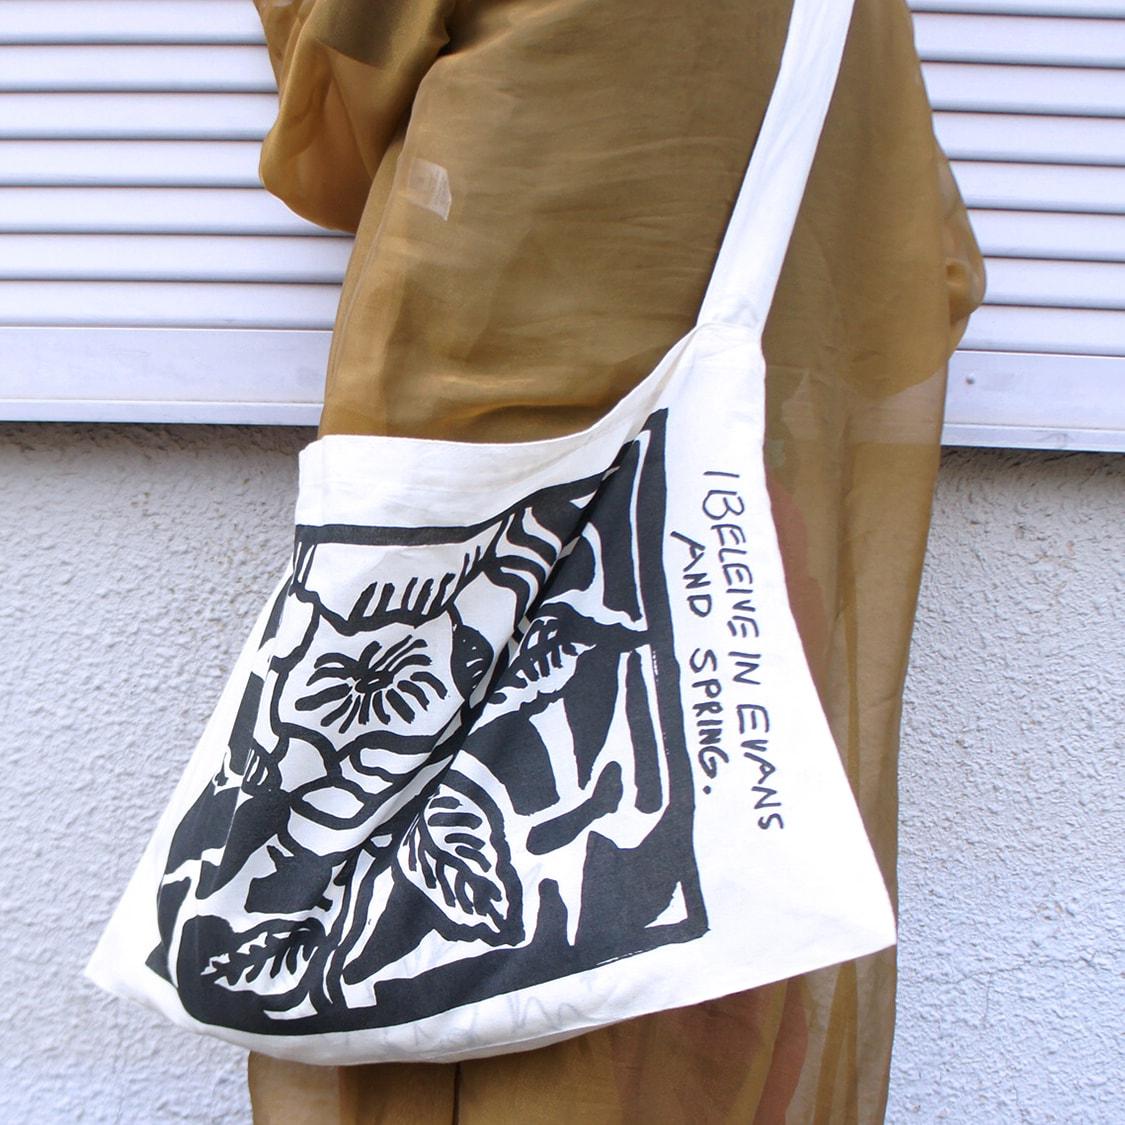 SPRING UKABU sacoche bag:norahi〈UKABU apparel〉のサコッシュ